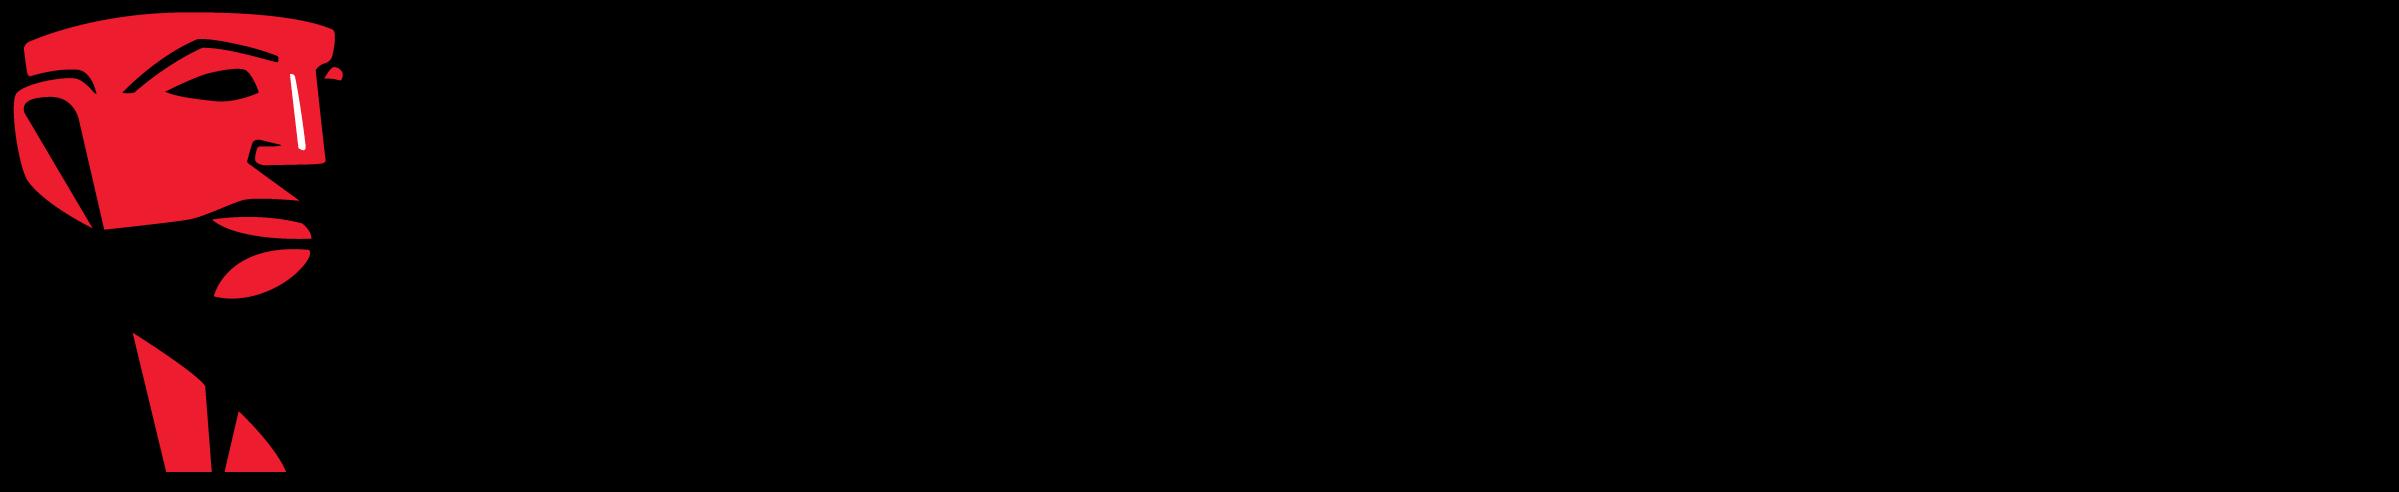 Kingston-logo-1